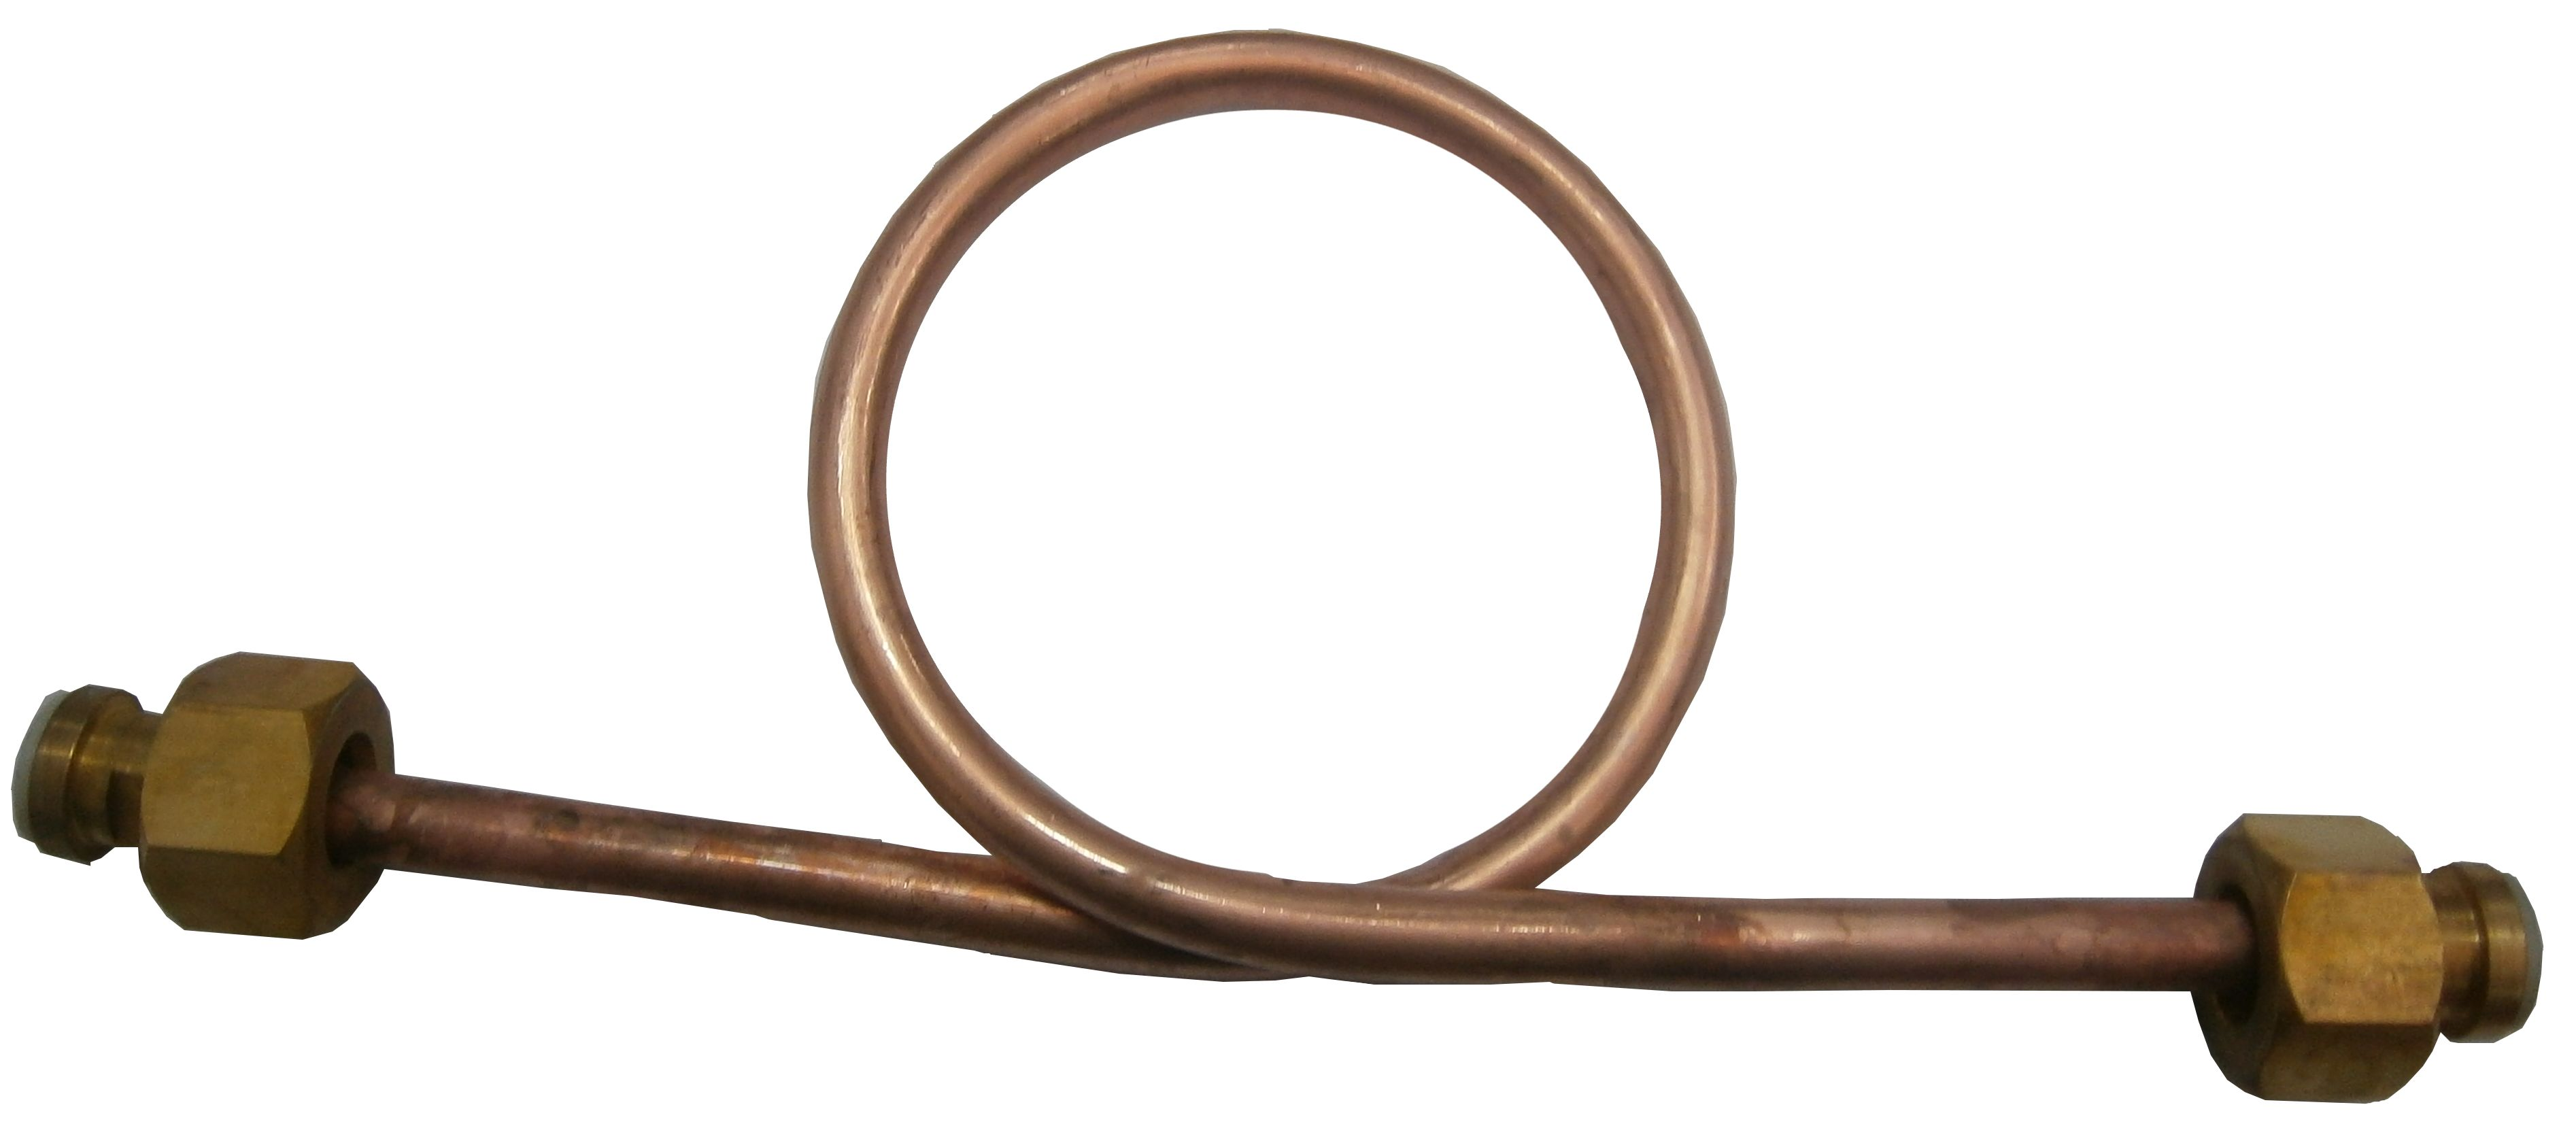 Змеевик ЗМК межрамповый 34-34 (122 медь)